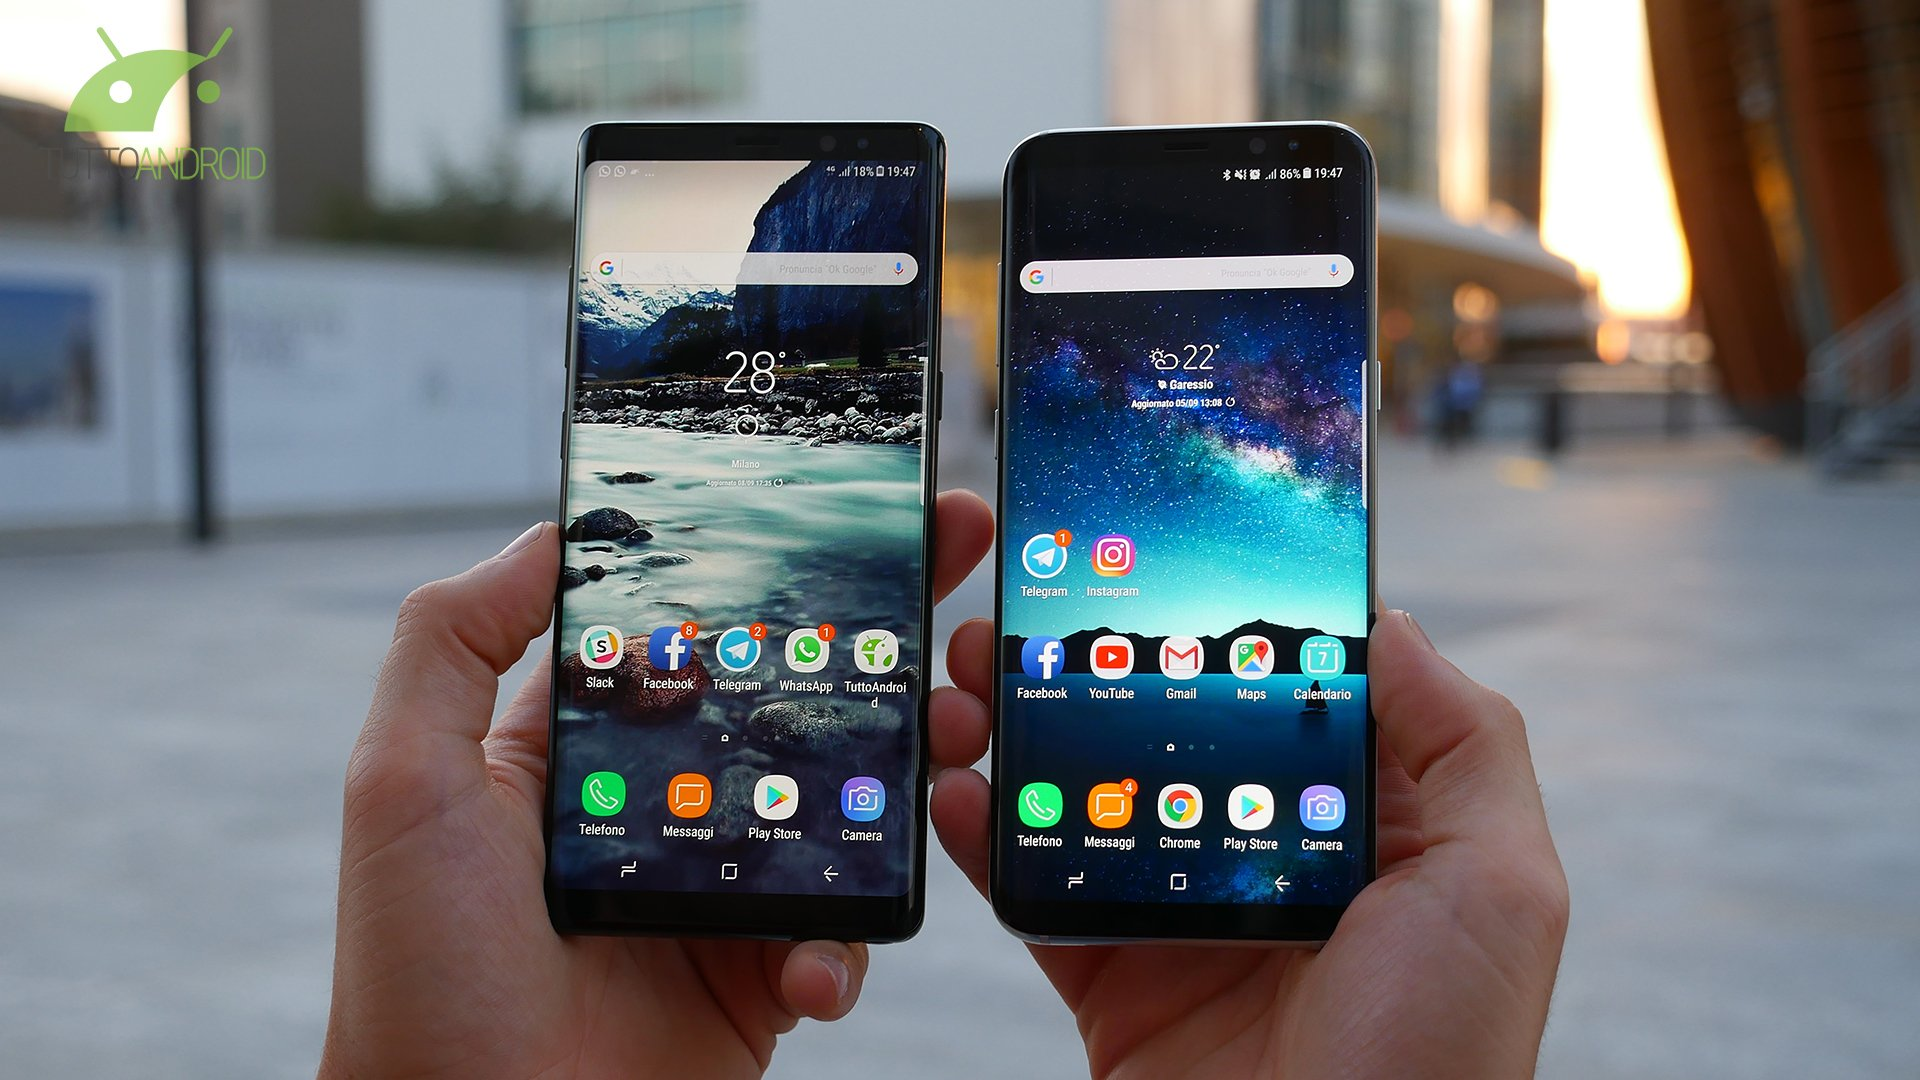 Samsung Galaxy Note 8 vs Samsung Galaxy S8+